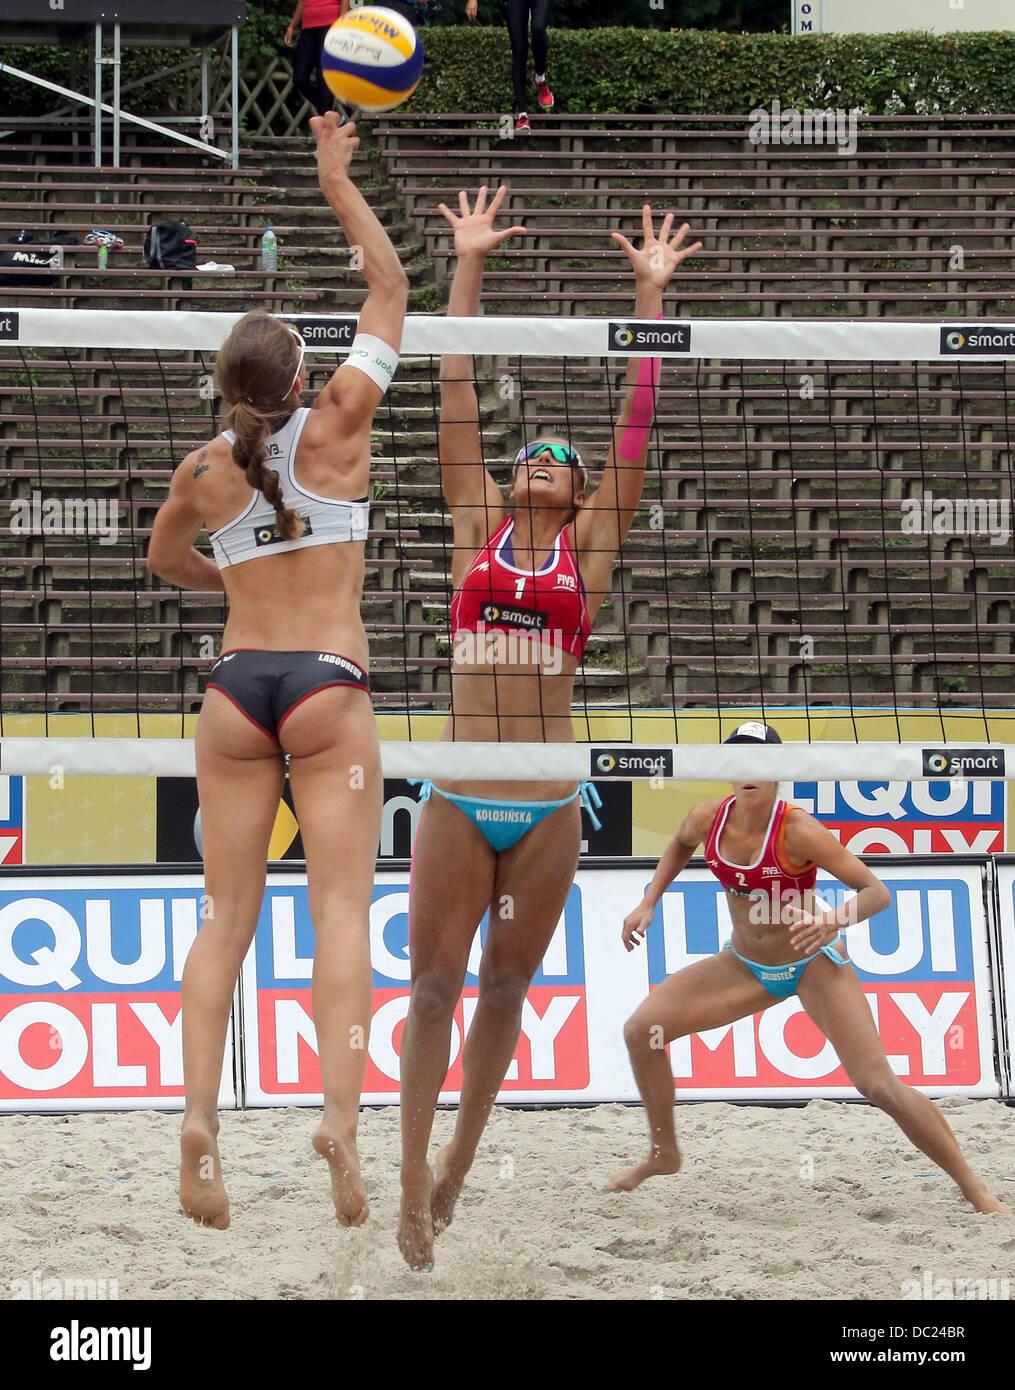 Kinga Kolosinska (C) from Poland and Chantal Laboureur (L ...